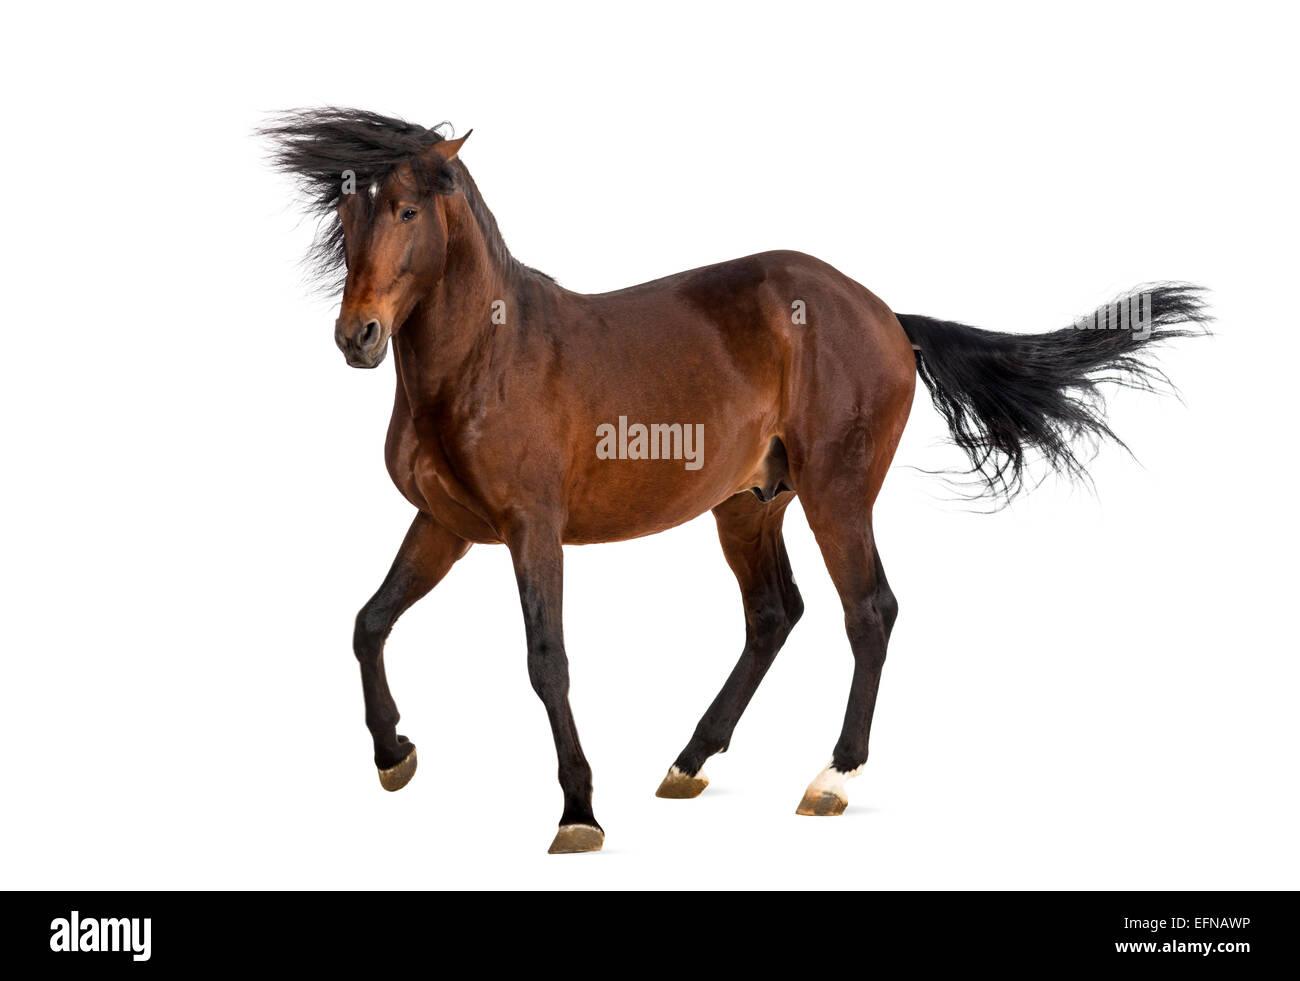 Caballo Andaluz trotting Imagen De Stock